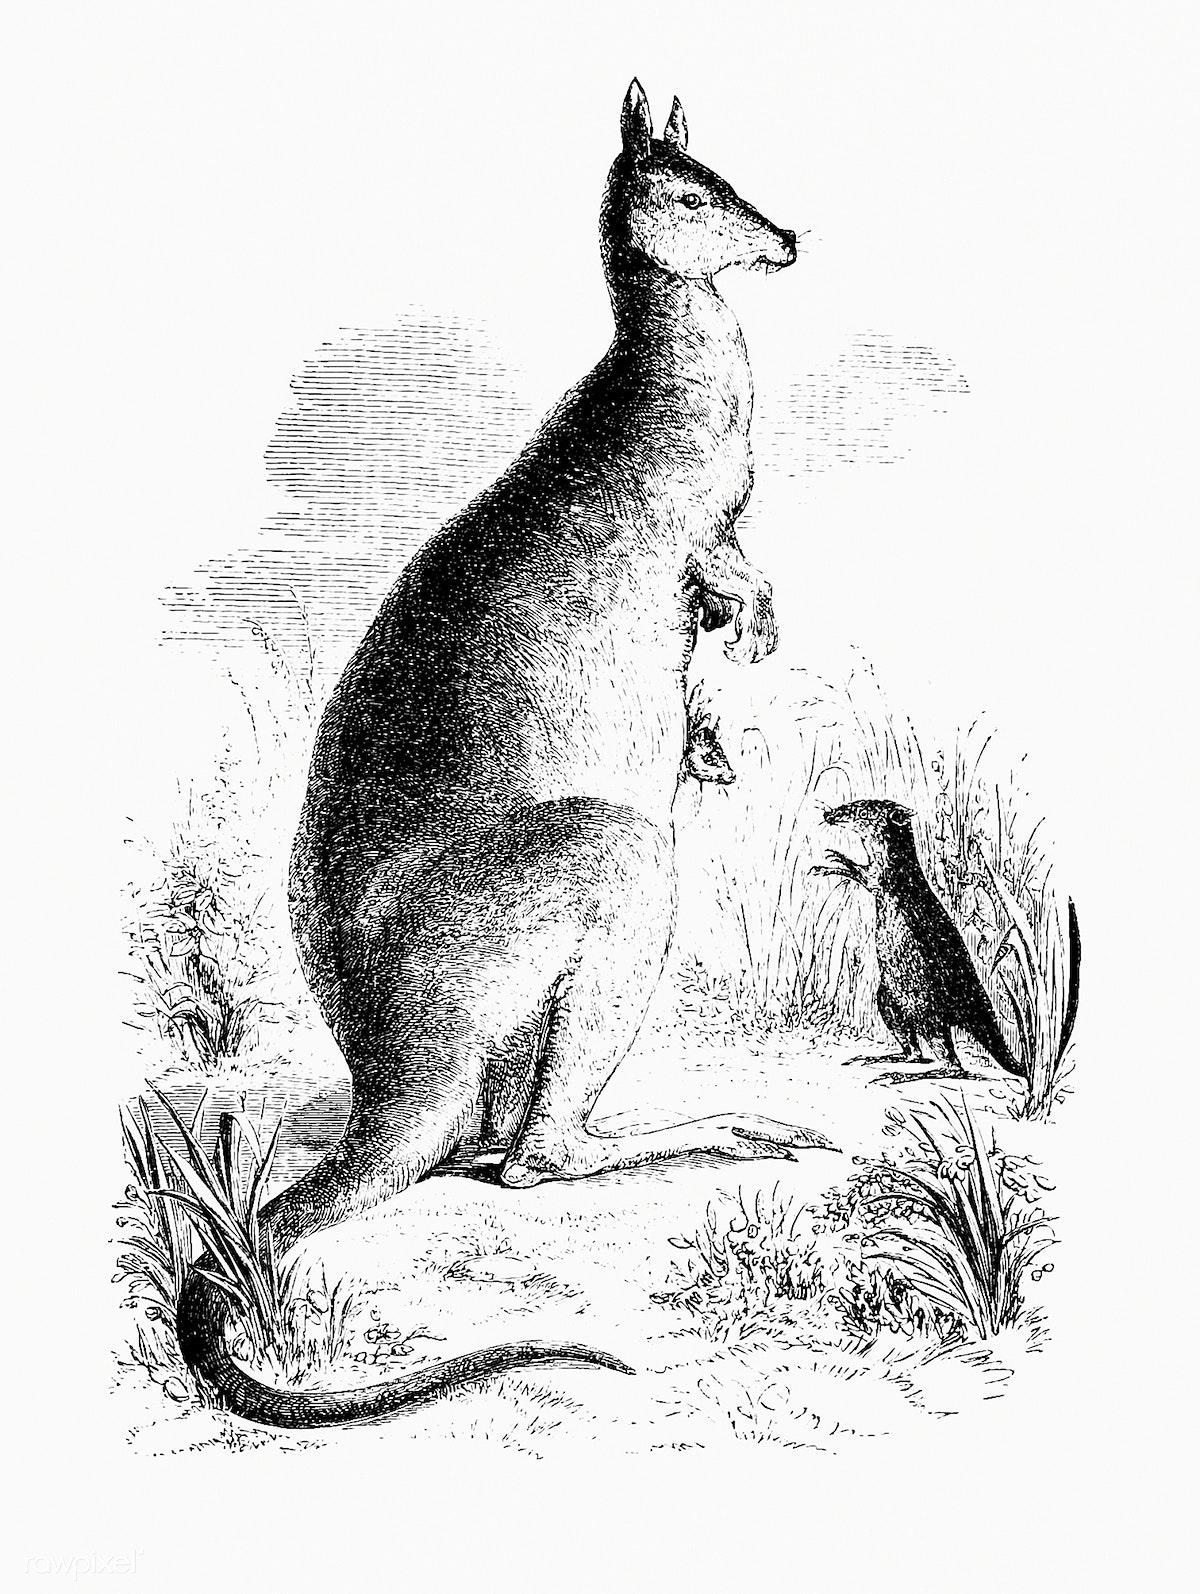 Drawing of kangaroo and kangaroo rat